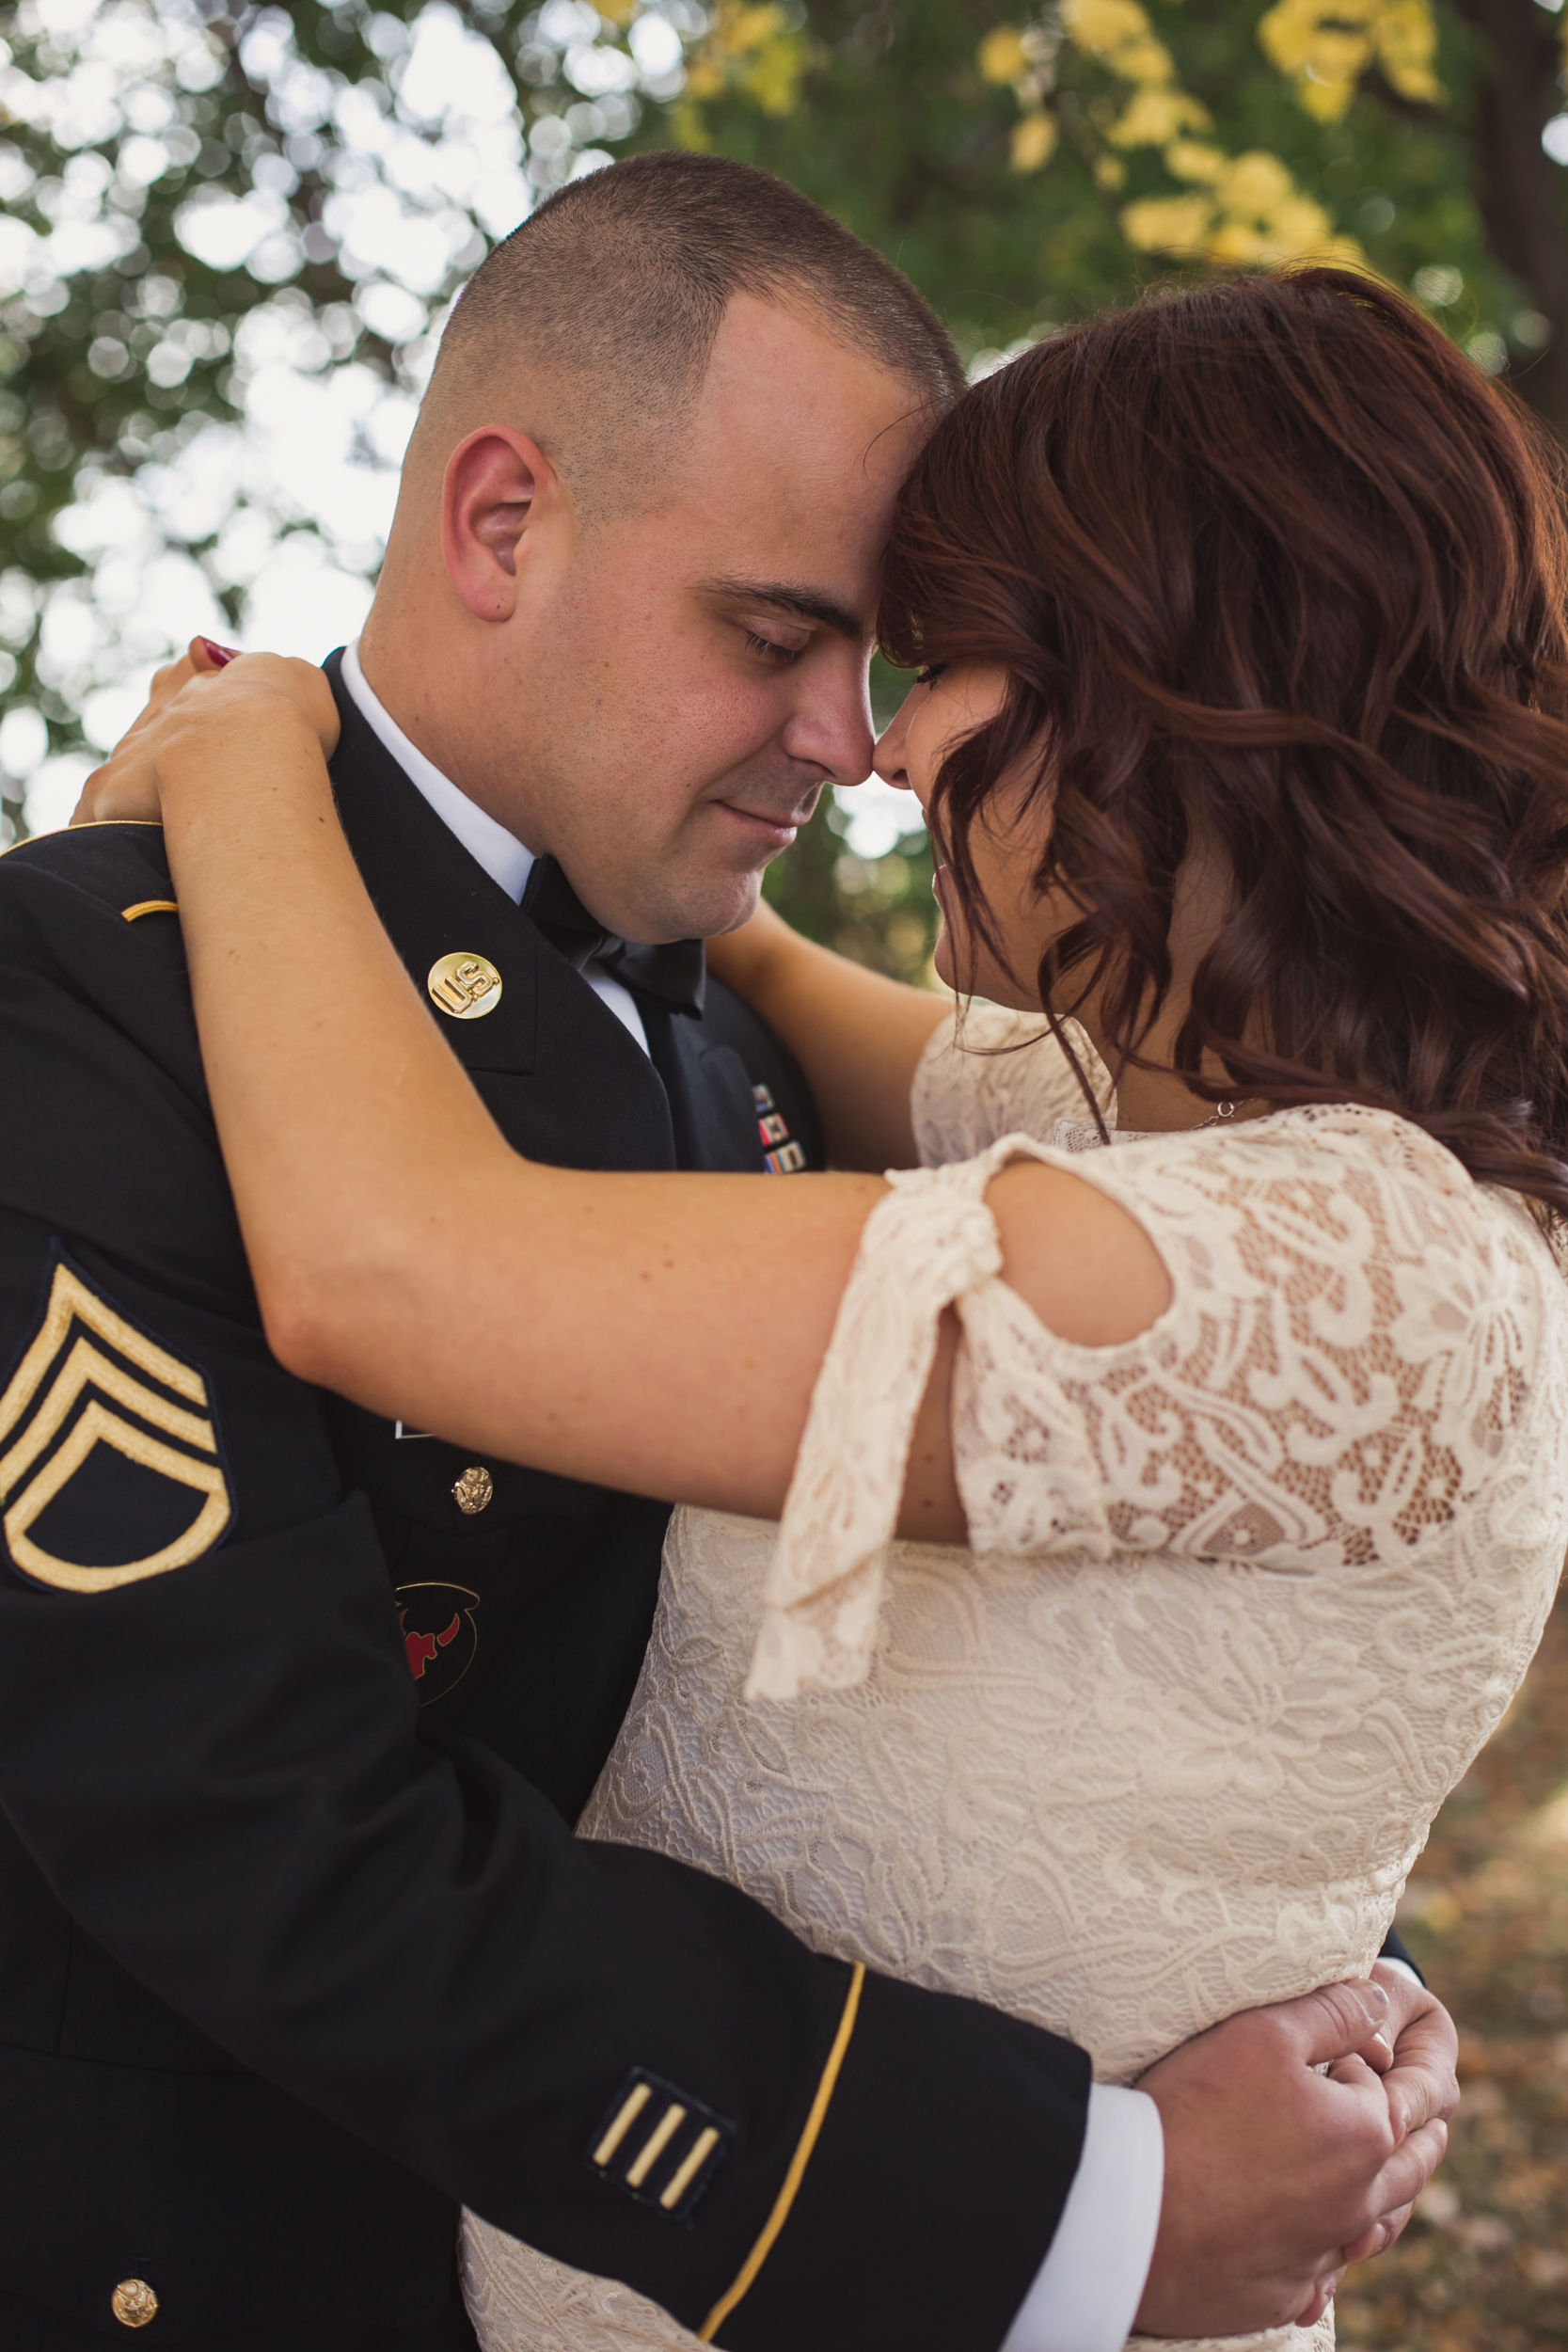 Fort Snelling Elopement St. Paul, MN, Fort Snelling Elopement, Military Elopement, Intimate Military Wedding, intimate elopement wedding-www.rachelsmak.com4.jpg